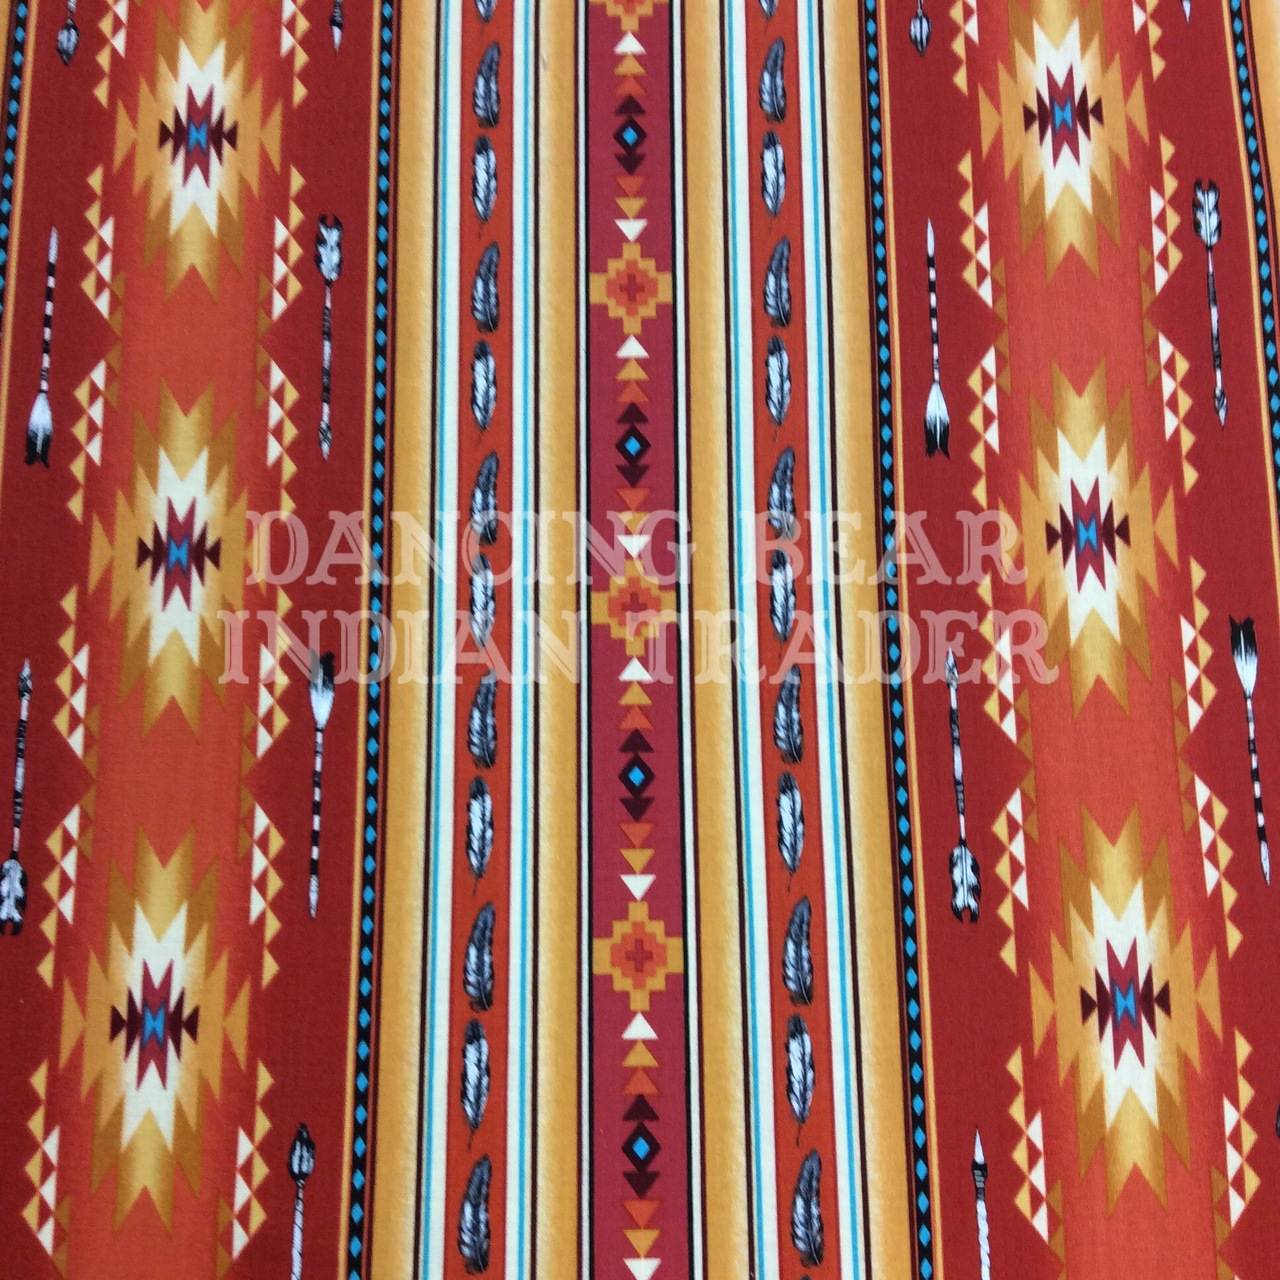 Native Pattern Stripe Feather Terracotta - Back in stock September 2020